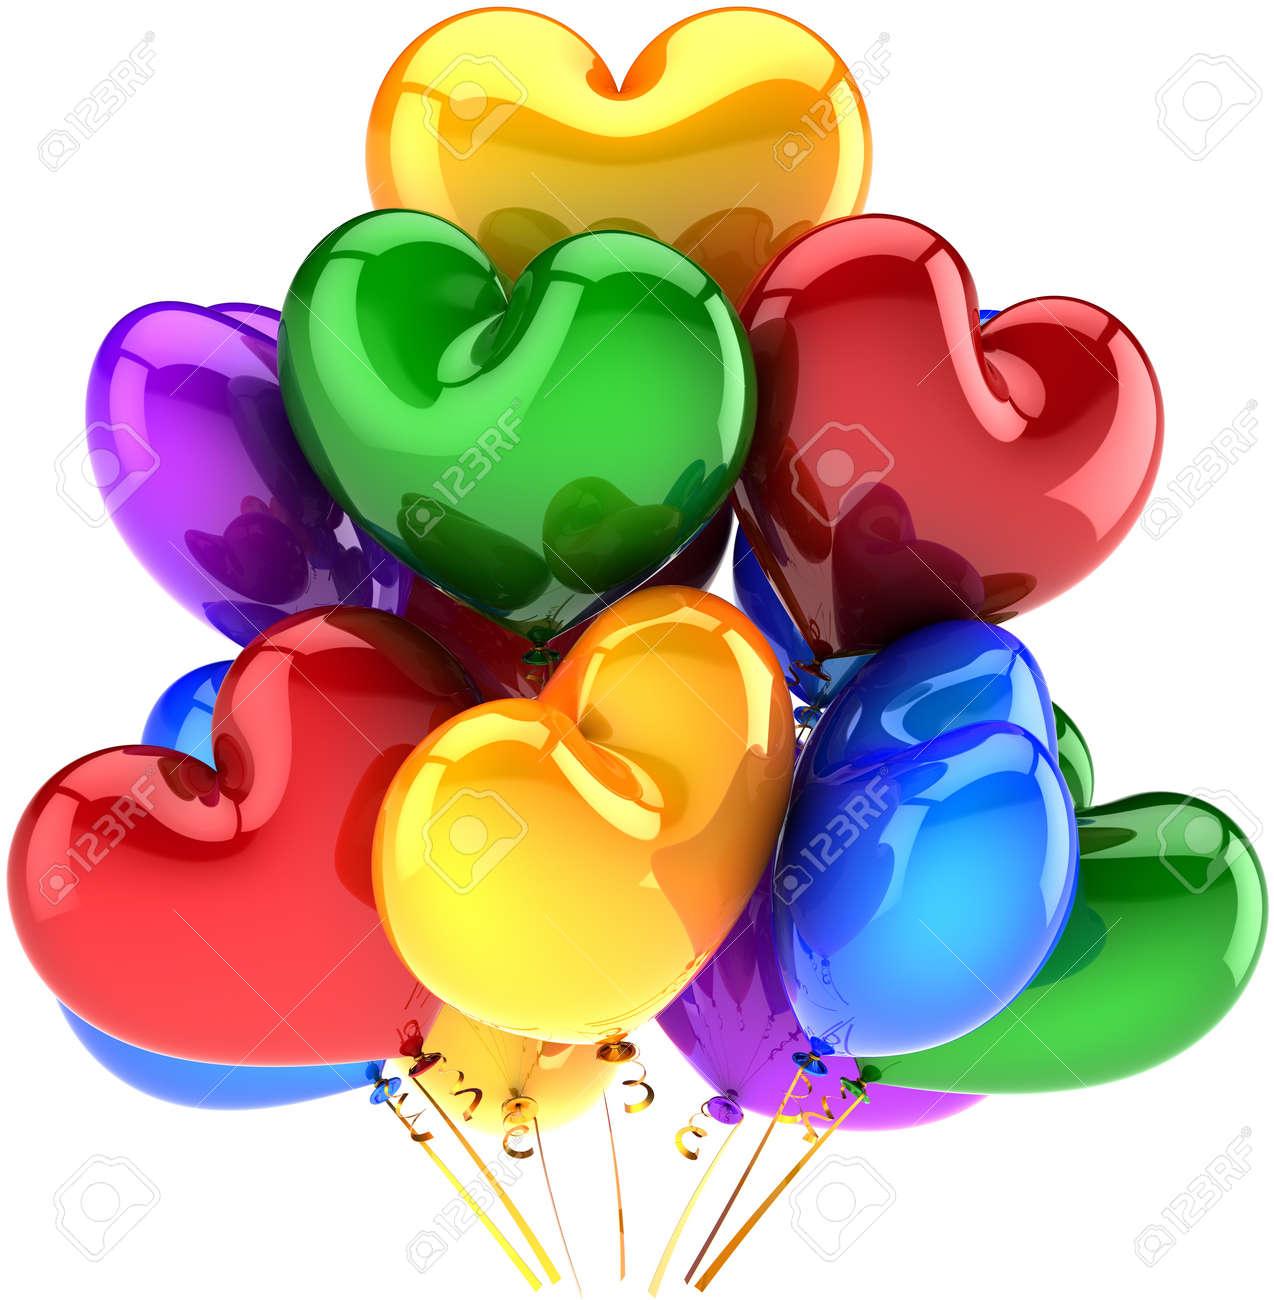 Birthday Balloons Stock Photos & Pictures. Royalty Free Birthday ...